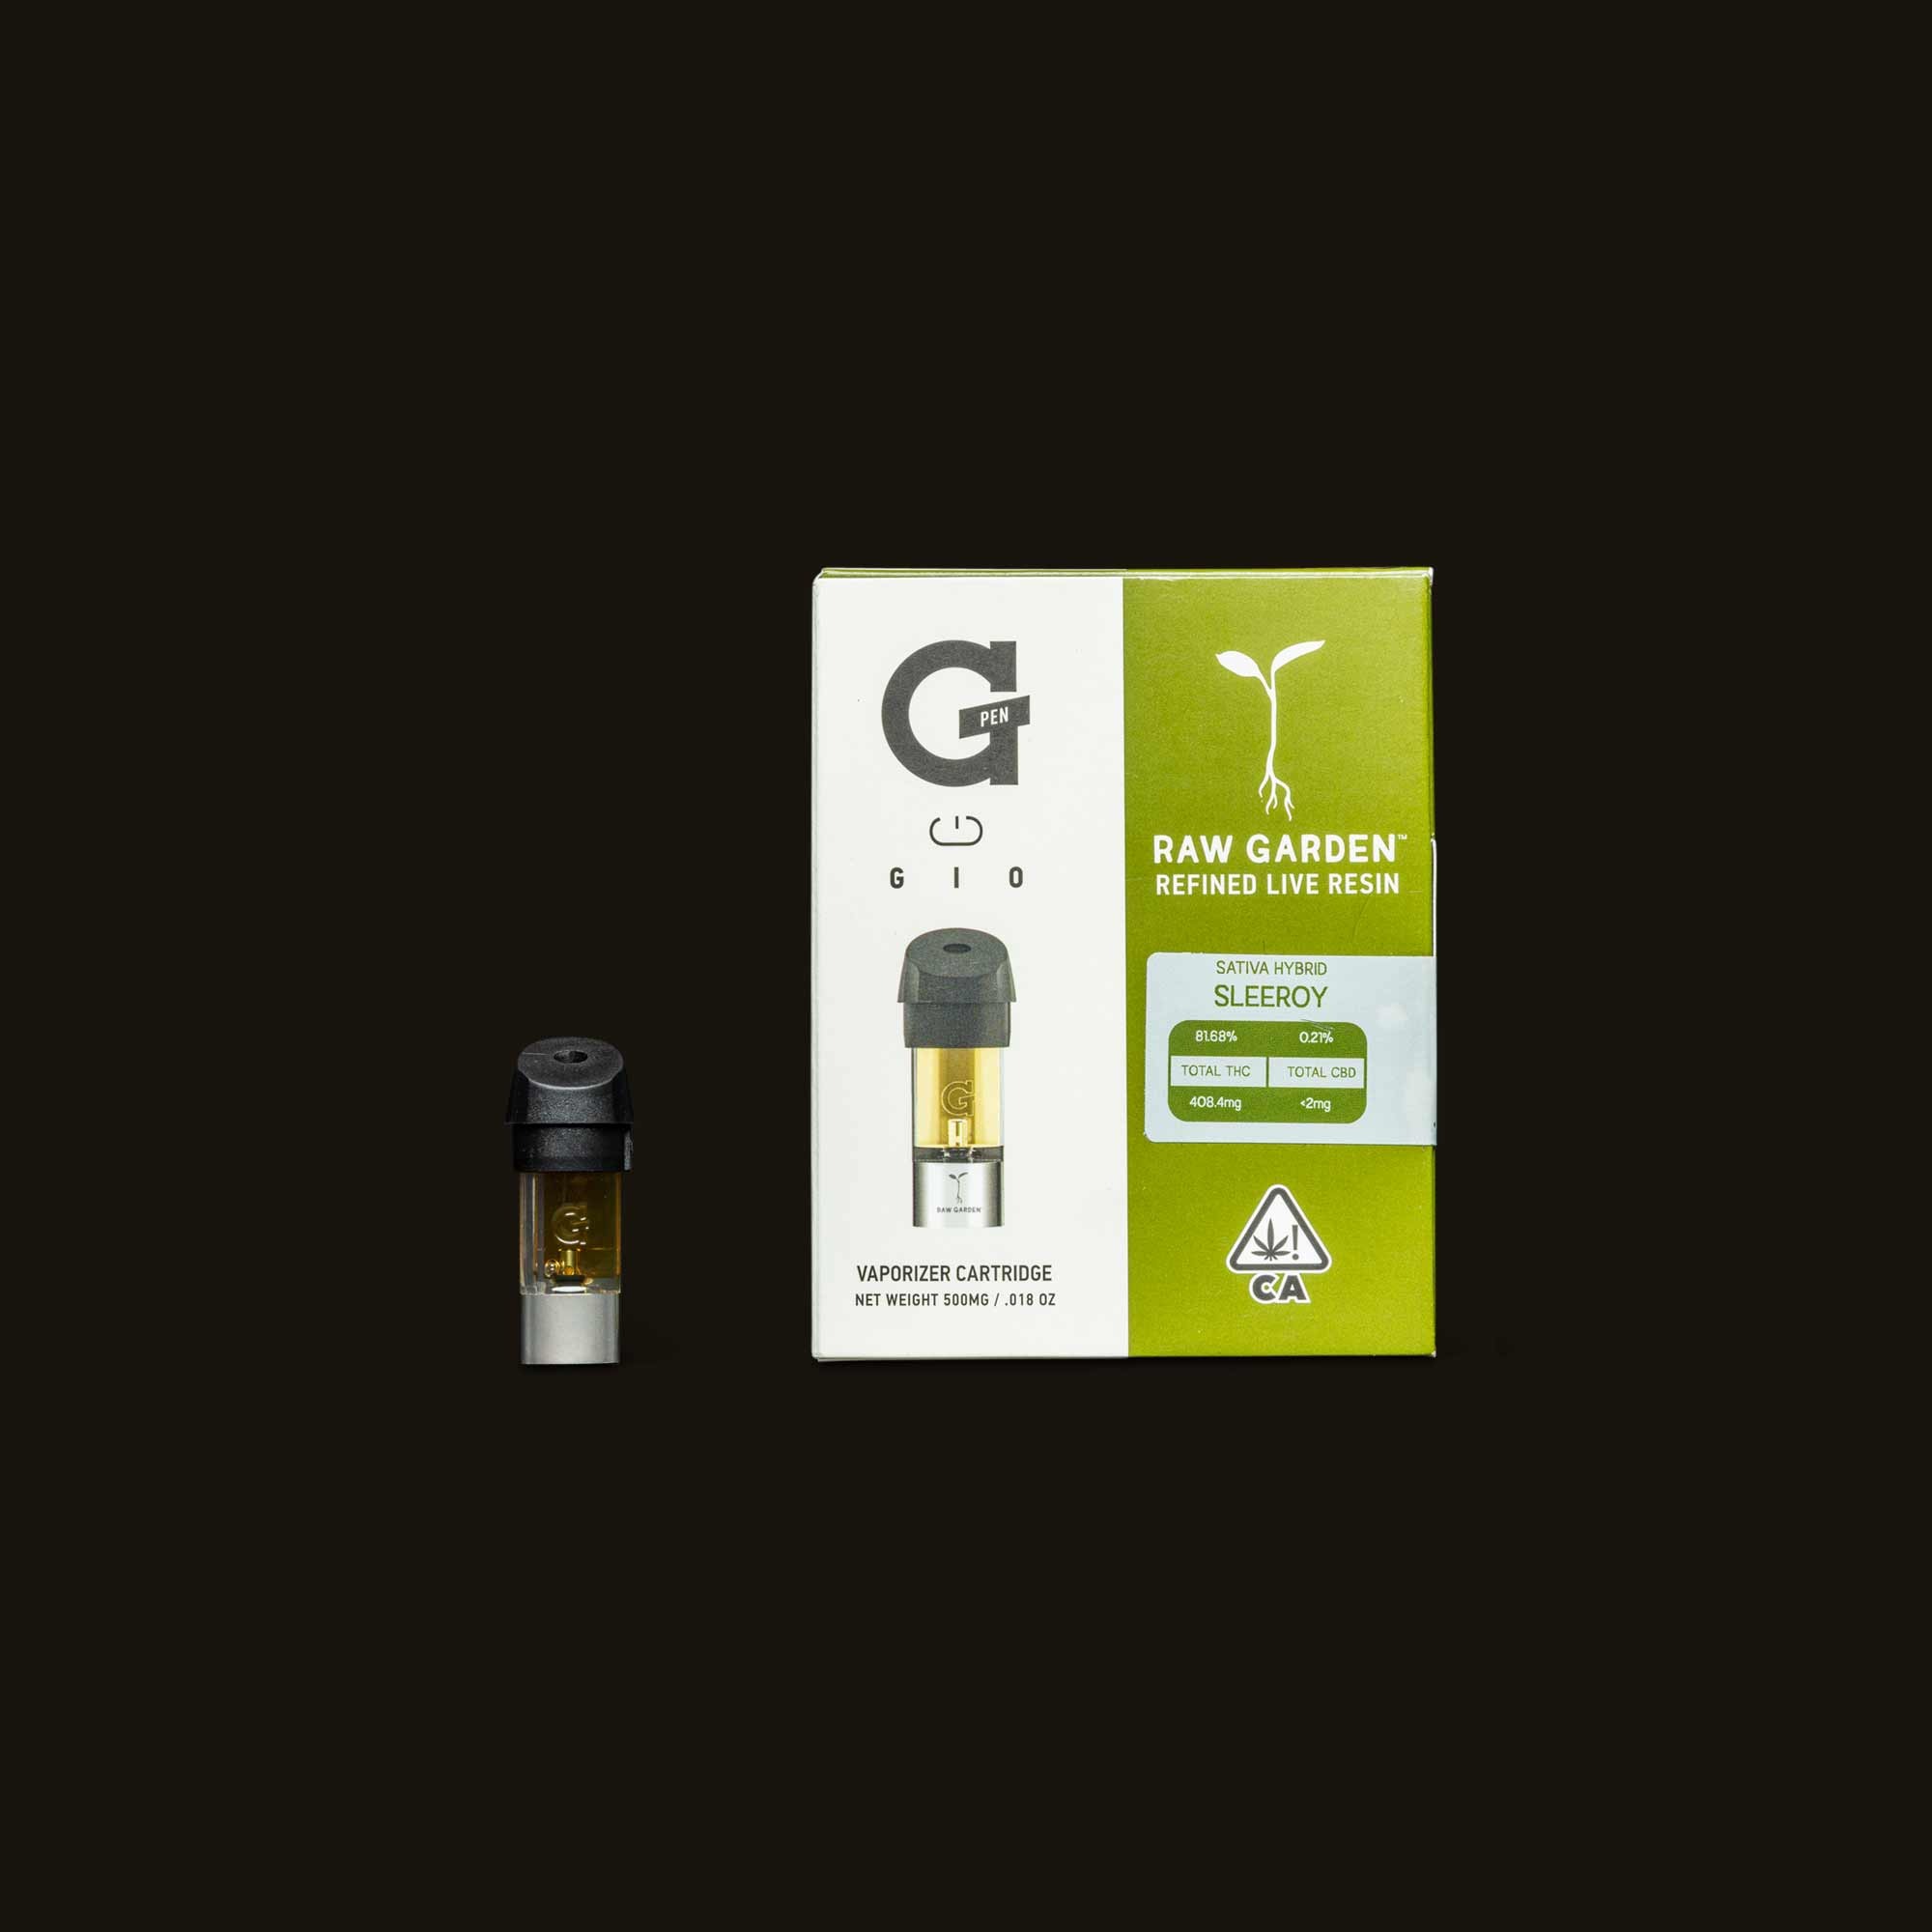 Sleeroy GIO Pod from Raw Garden